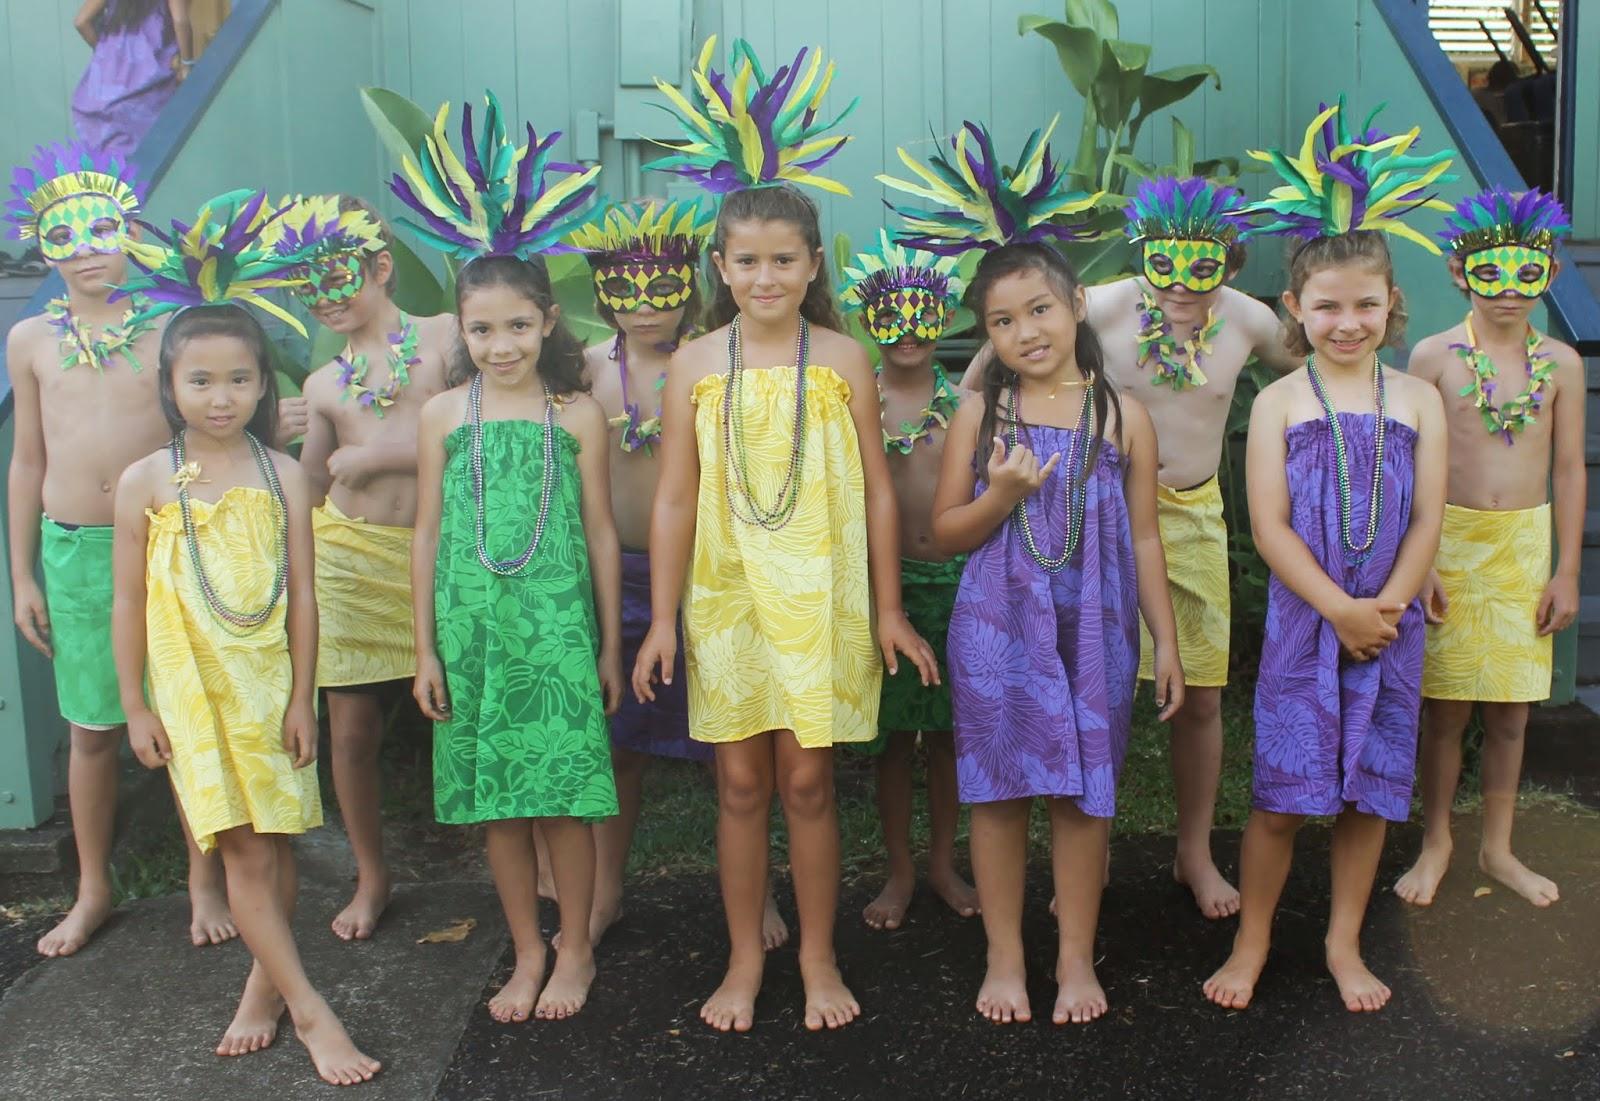 Uncategorized Kids Mardi Gras may 2014 surfin through second